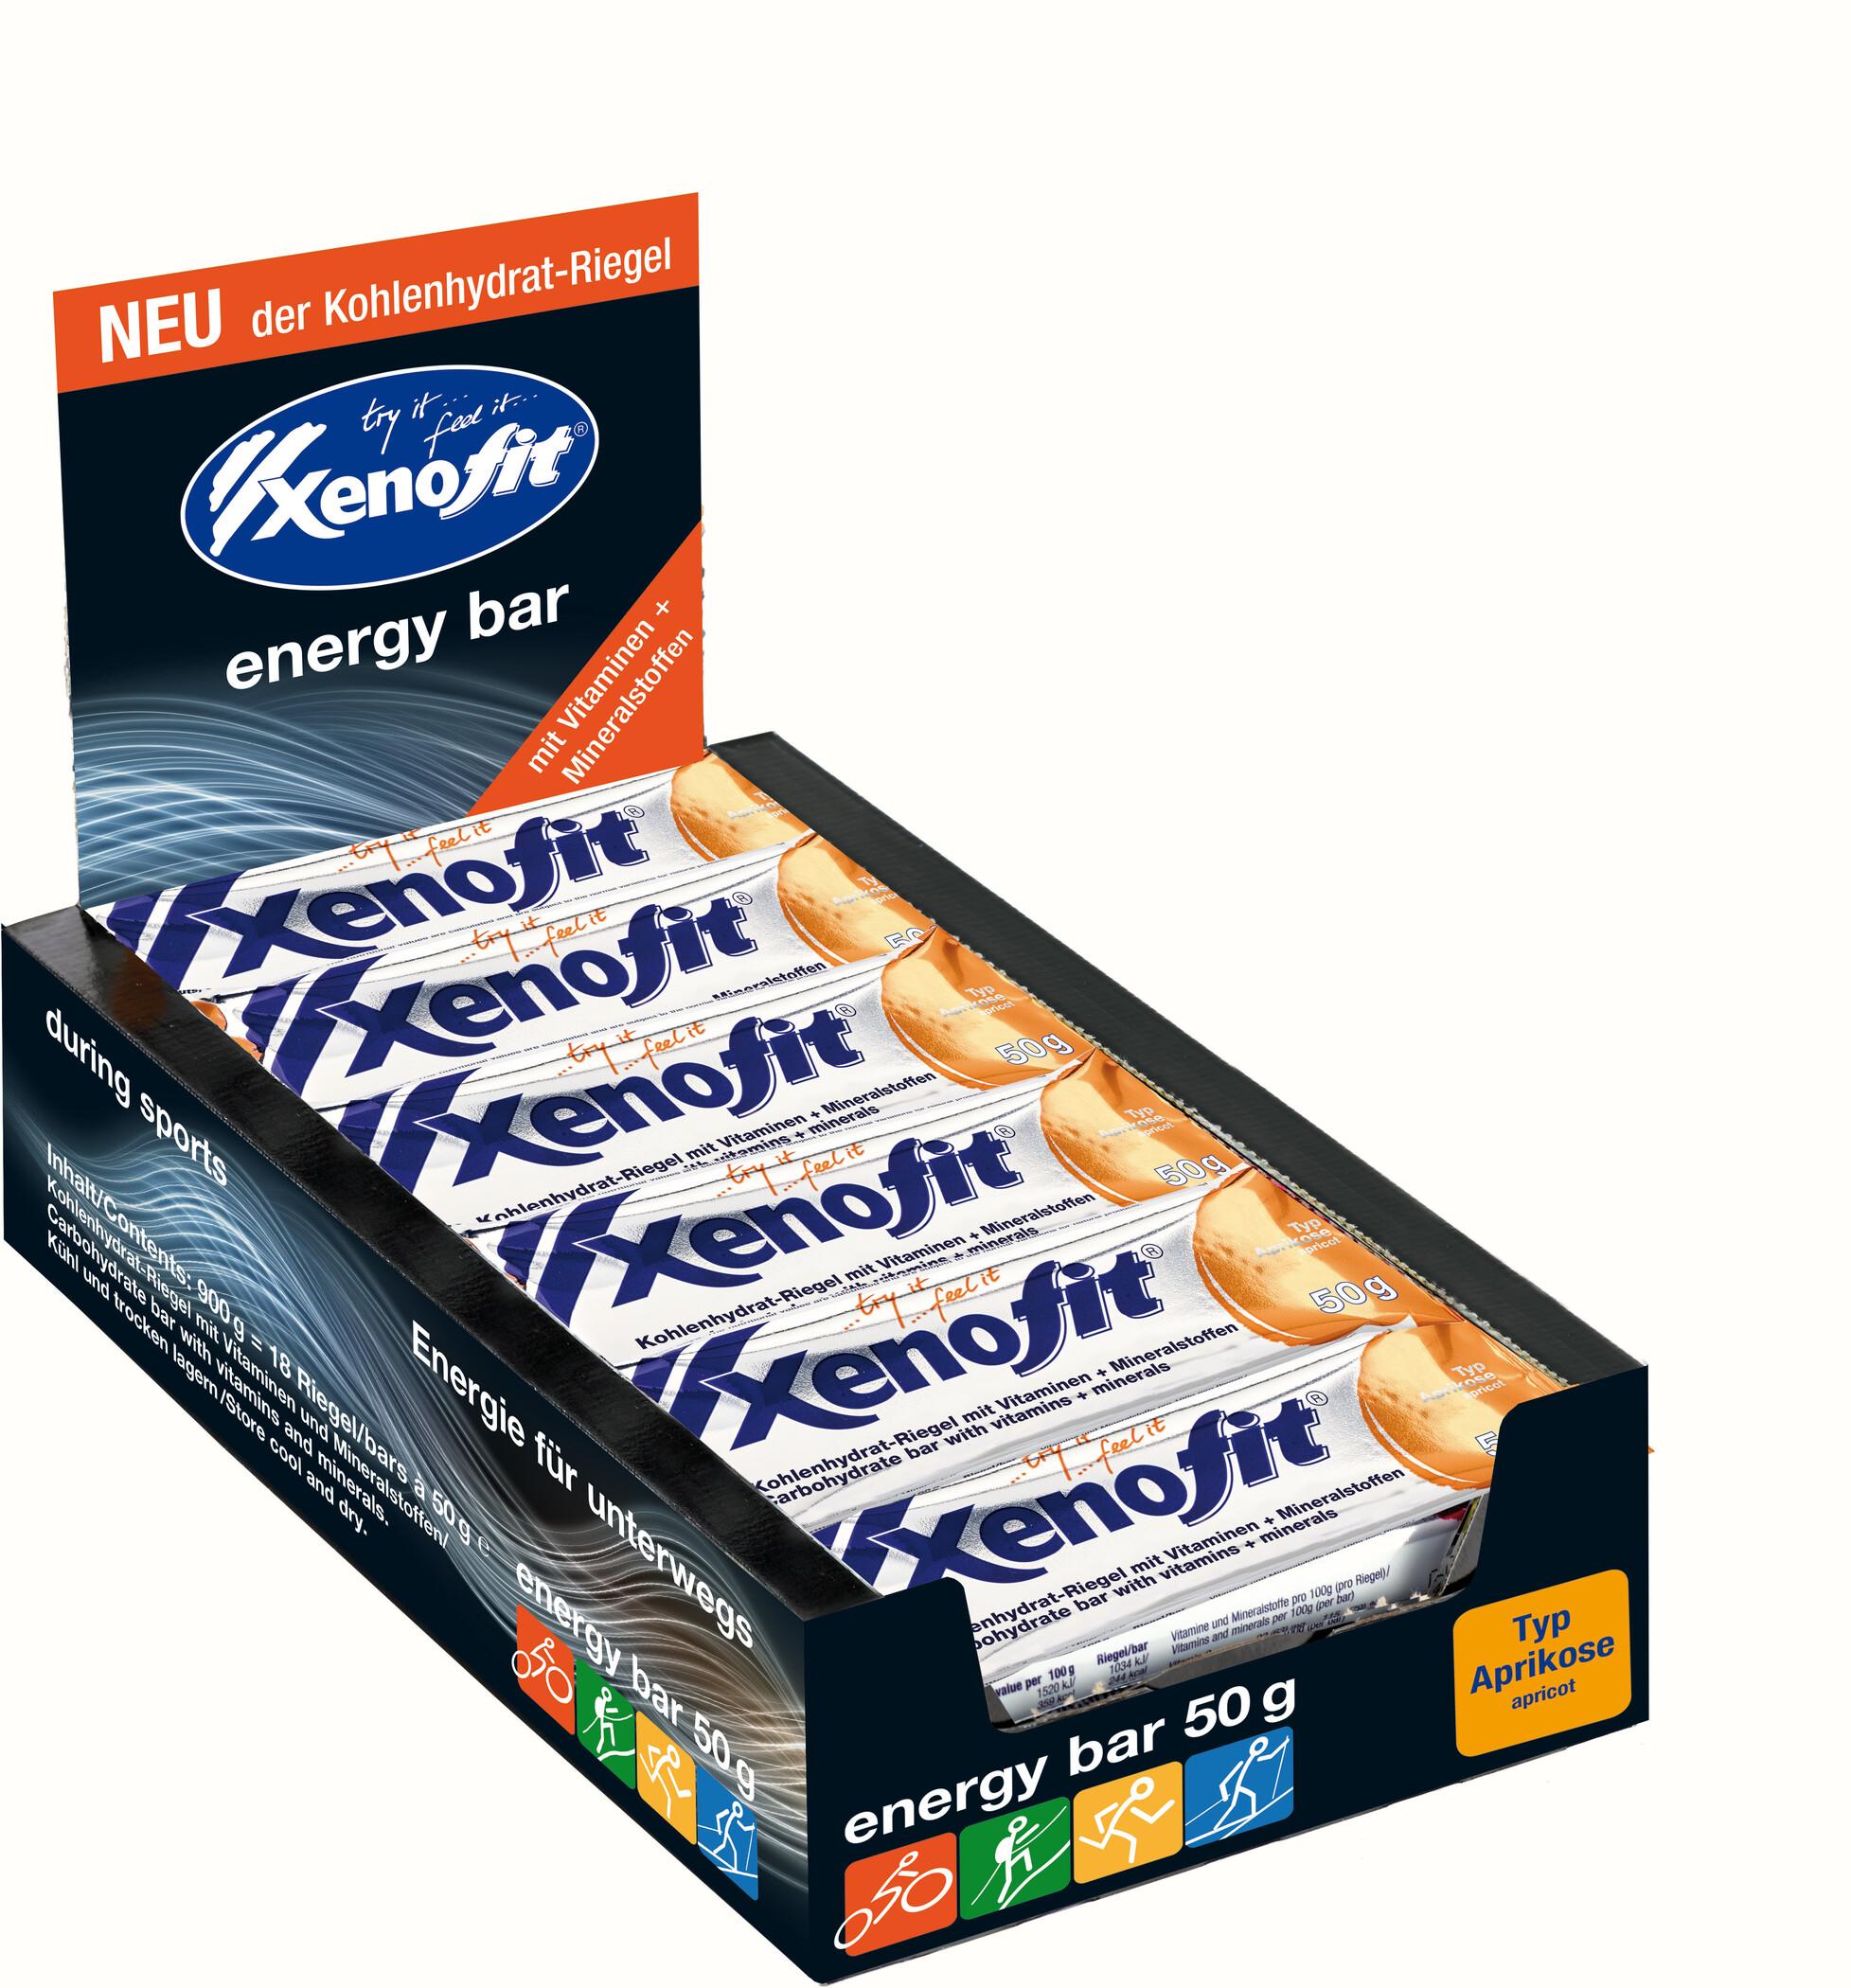 Xenofit Carbohydrate Bar Box 18x50g, Apricot (2019) | Energy bar